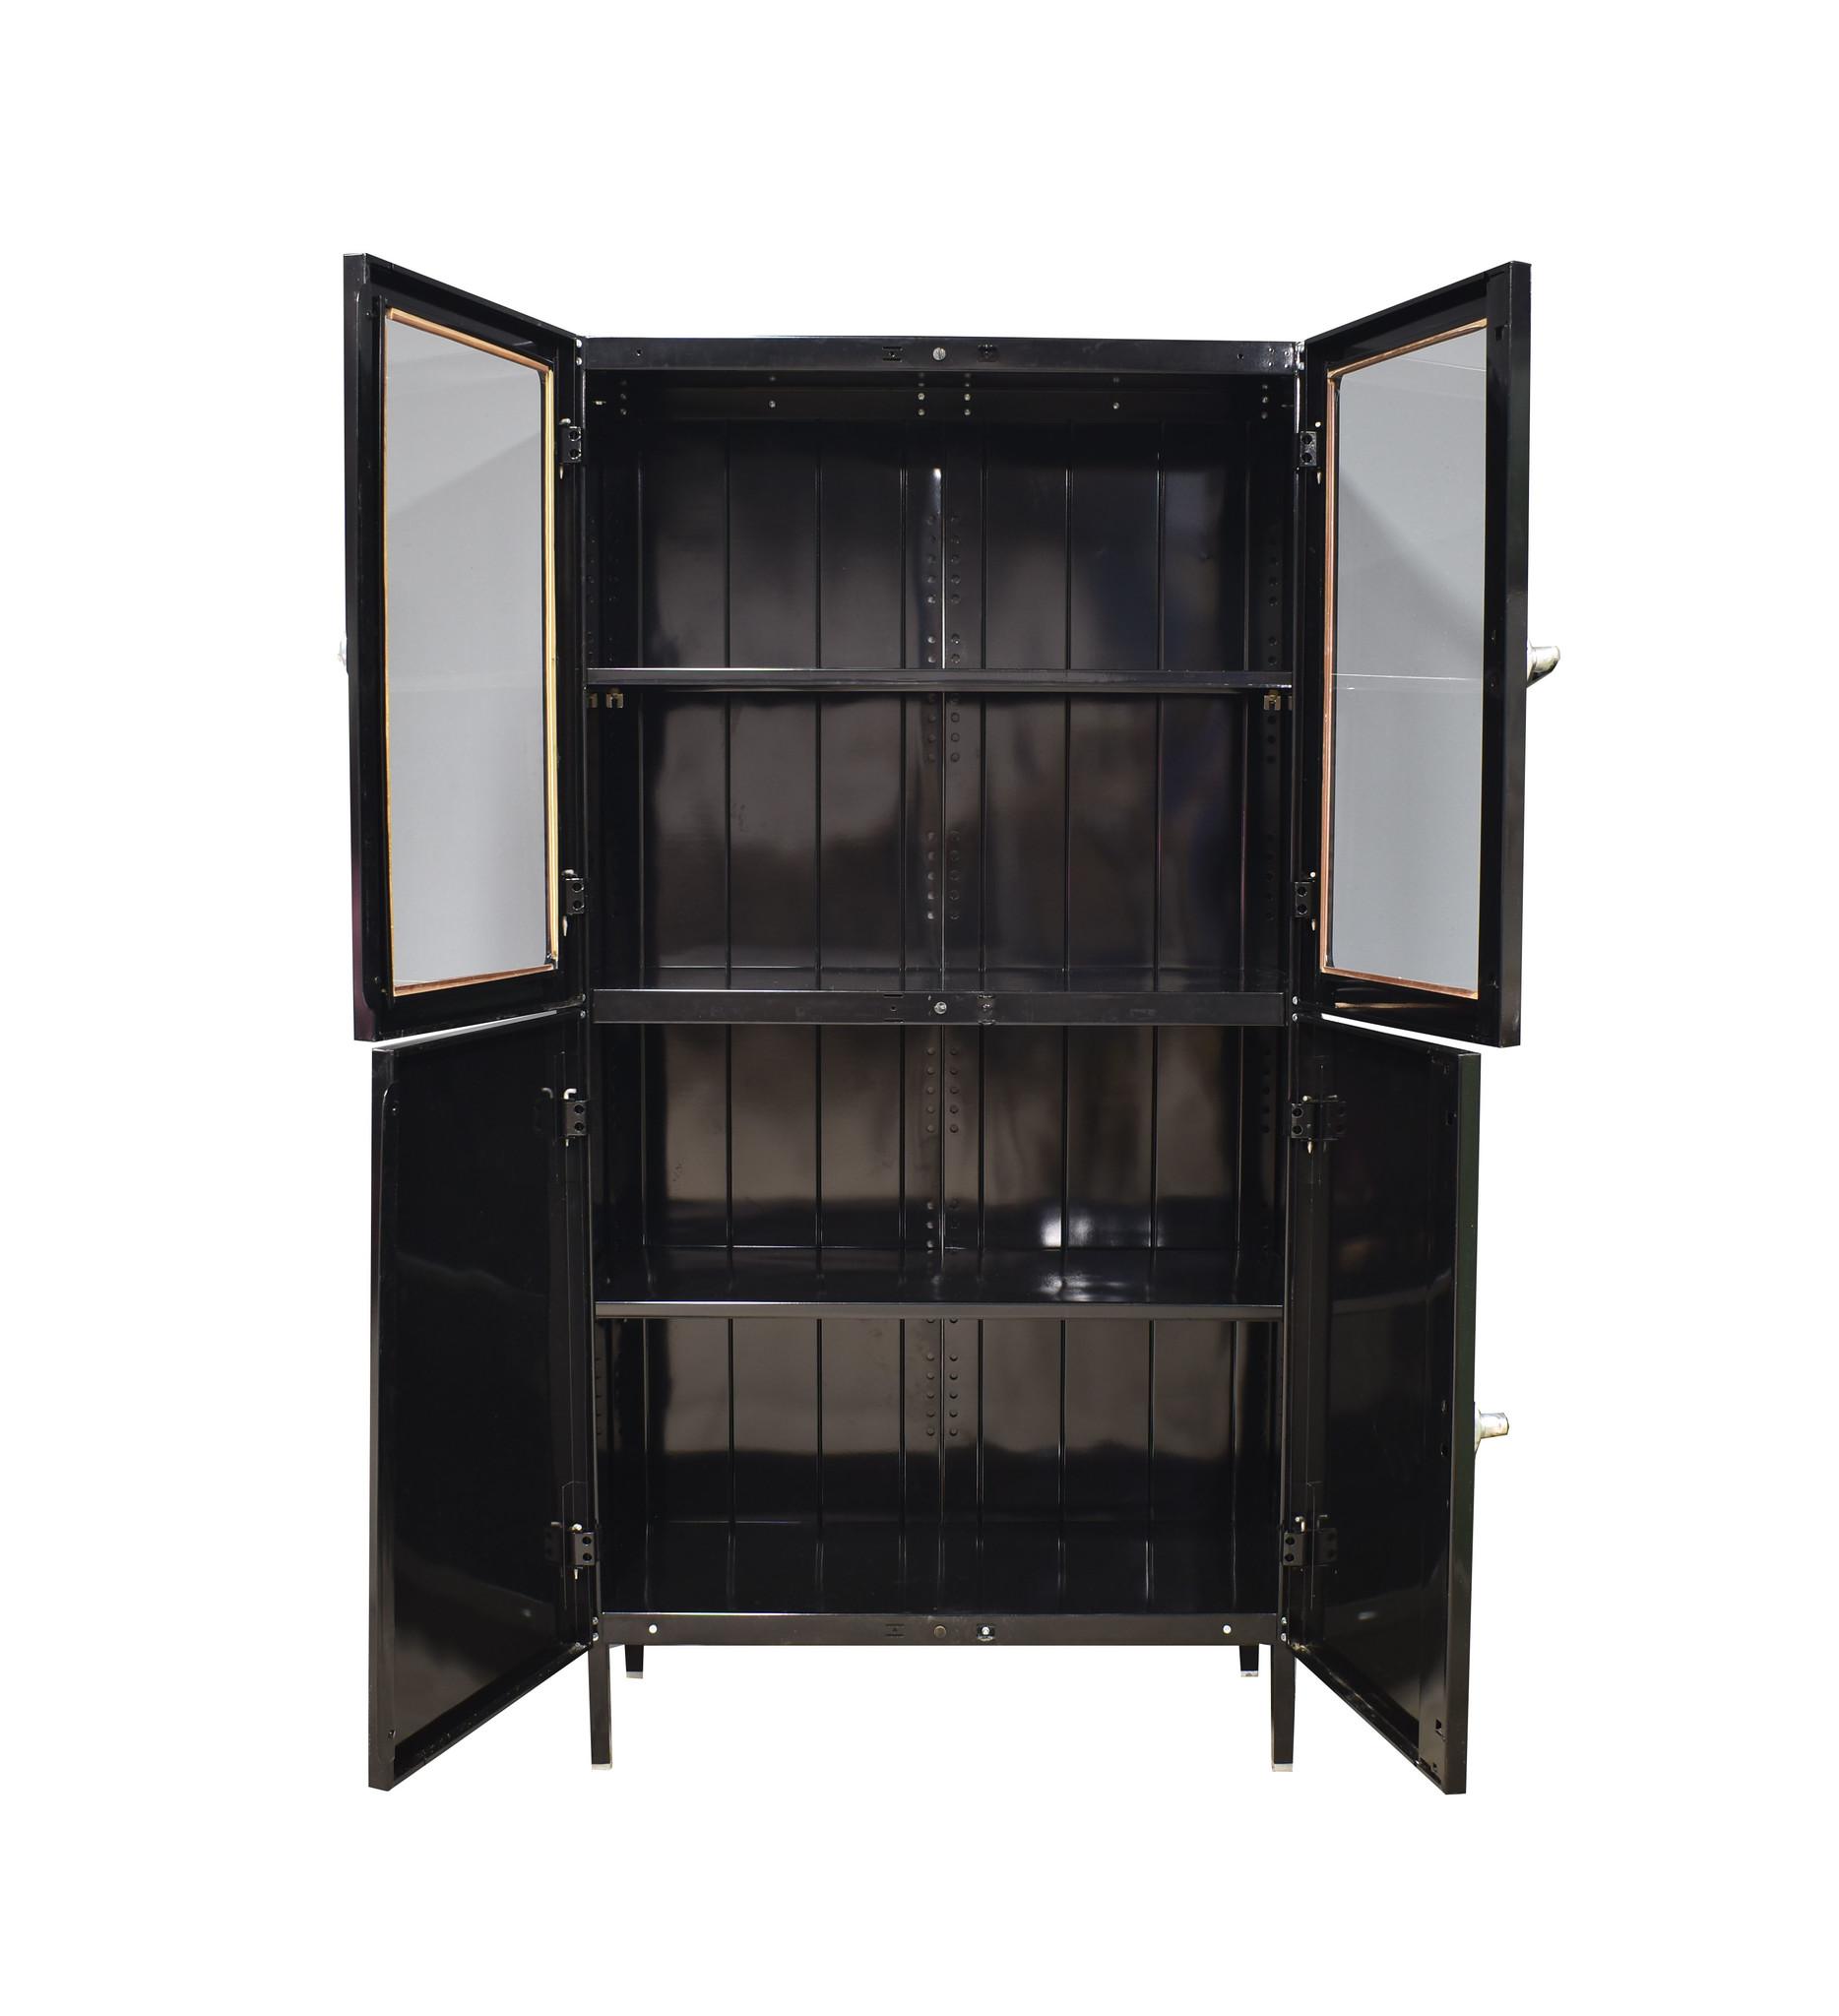 oldwood Vintage vitrinekast / Apothekerskast   zwart